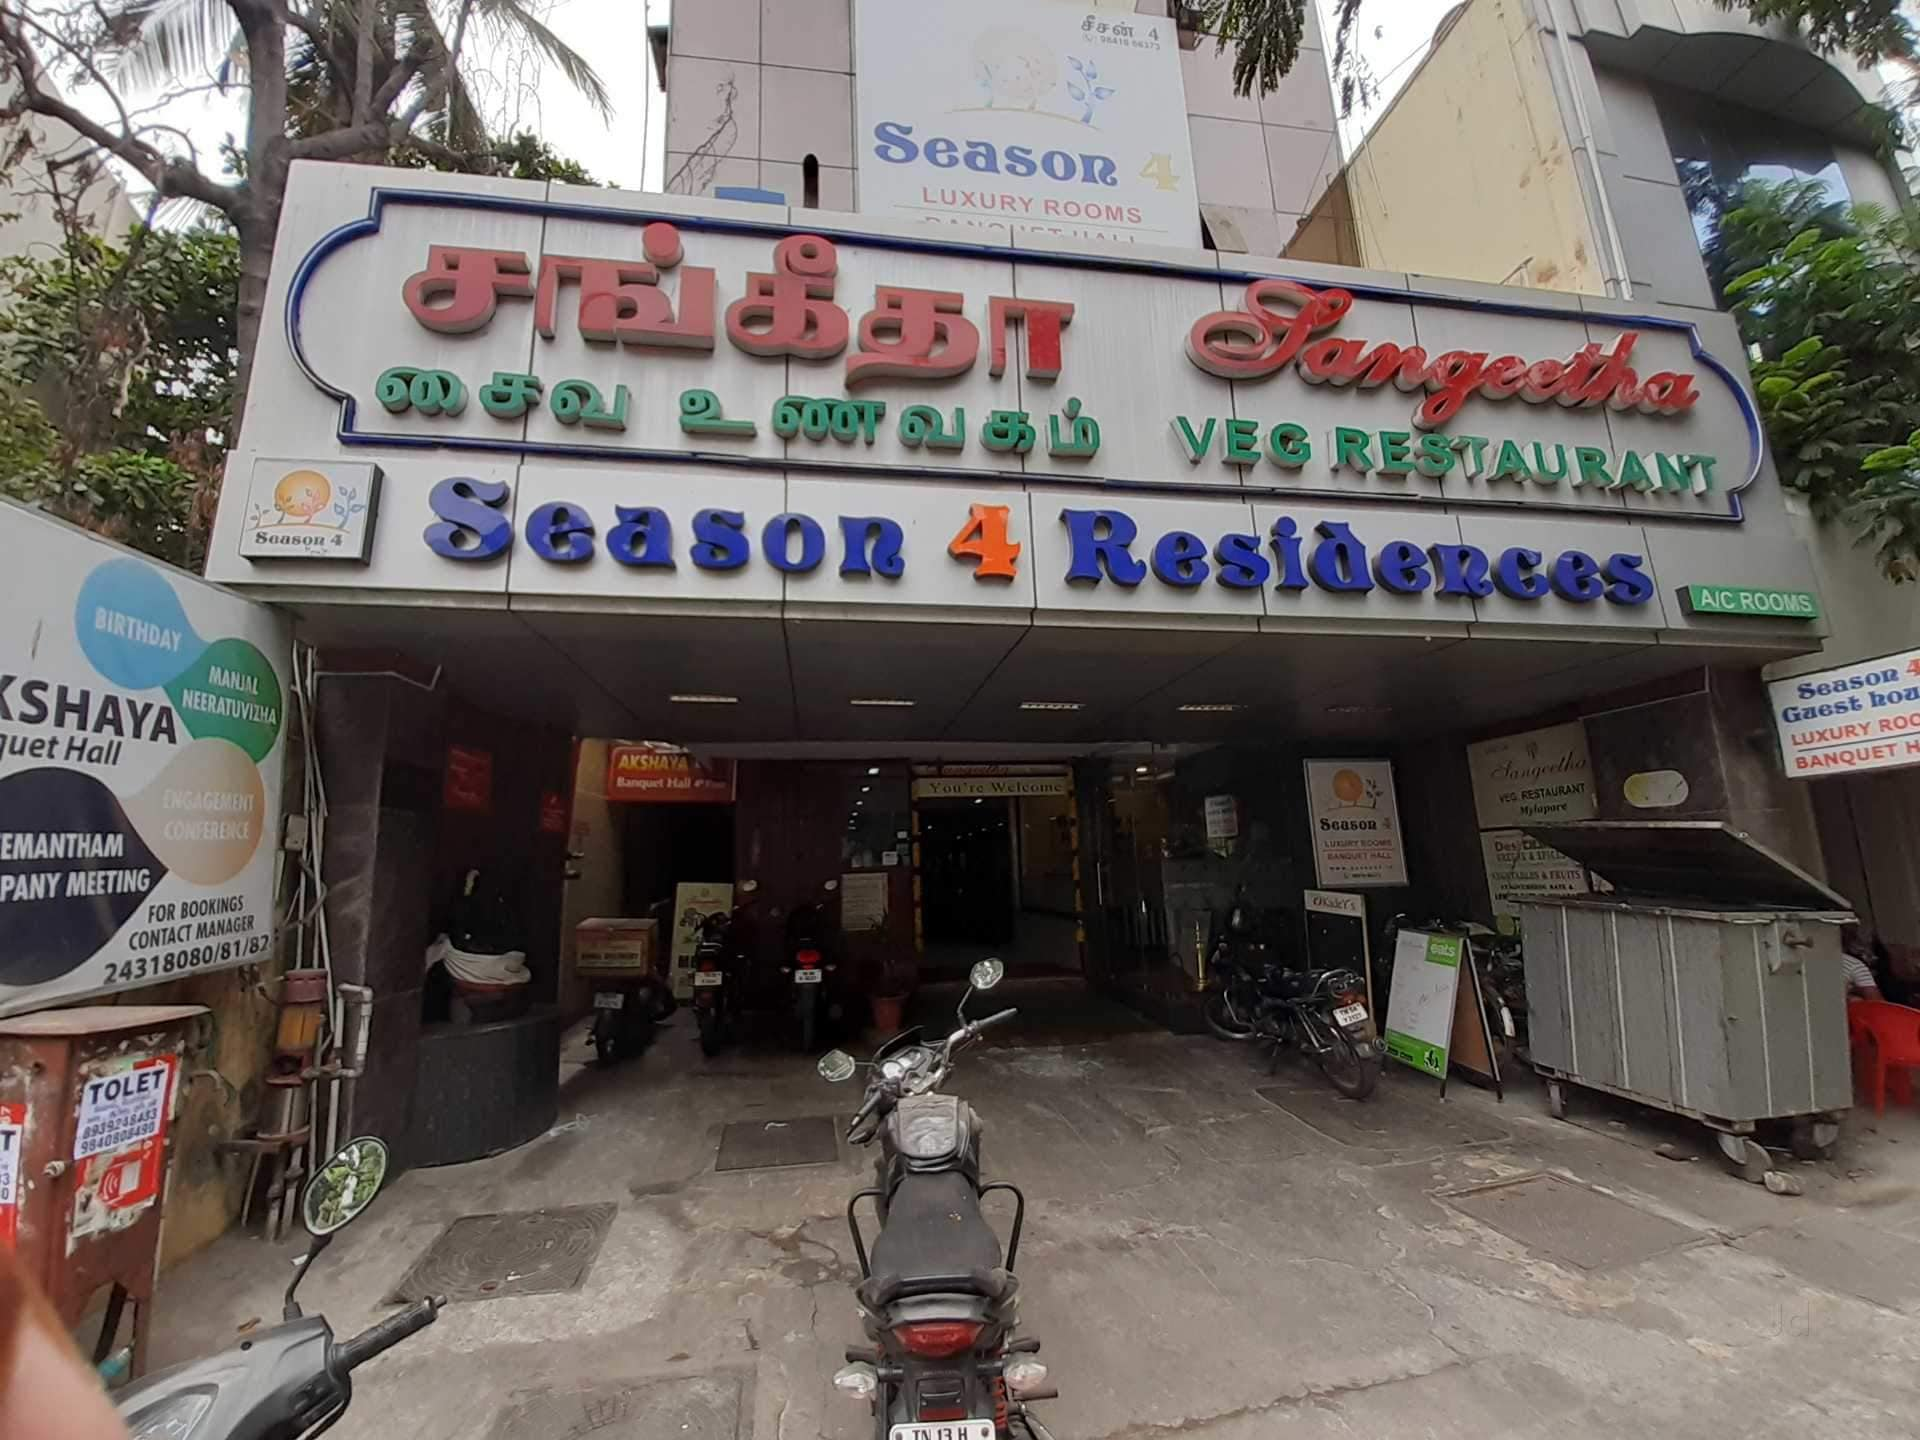 Munveedu Native Fine Dining Adyar Chennai Chinese Biryani South Indian Mughlai North Indian Indian Chettinad Pan Asian Cuisine Restaurant Justdial